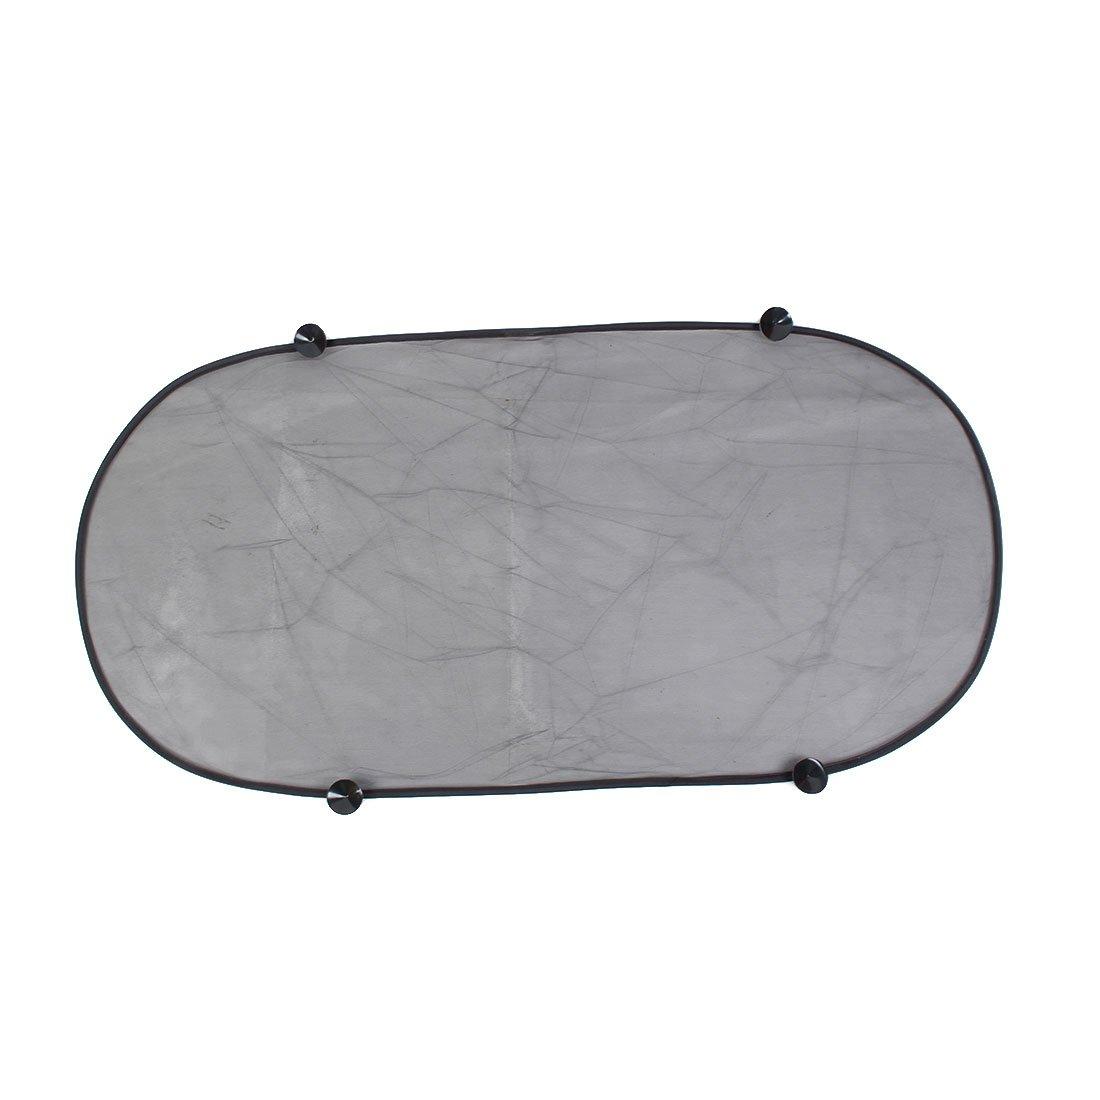 Uxcell a16012700ux0568 Folding Mesh Car Rear Windscreen Sun Visor Shade Sunshade 100cm x 50cm Black